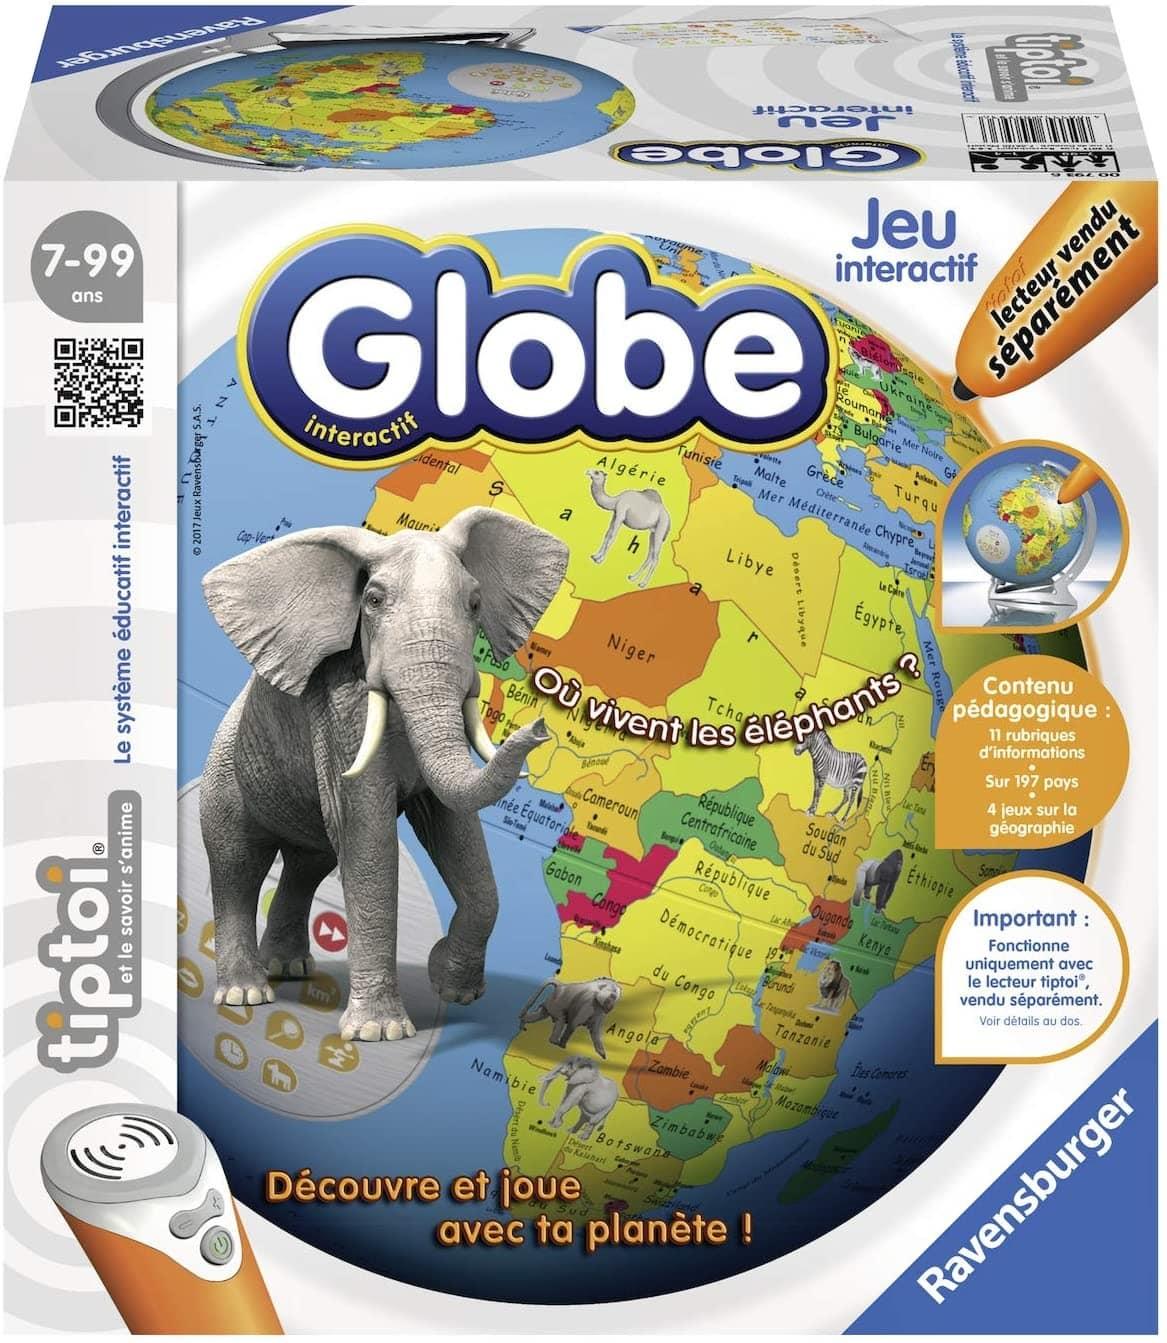 Un globe interactif